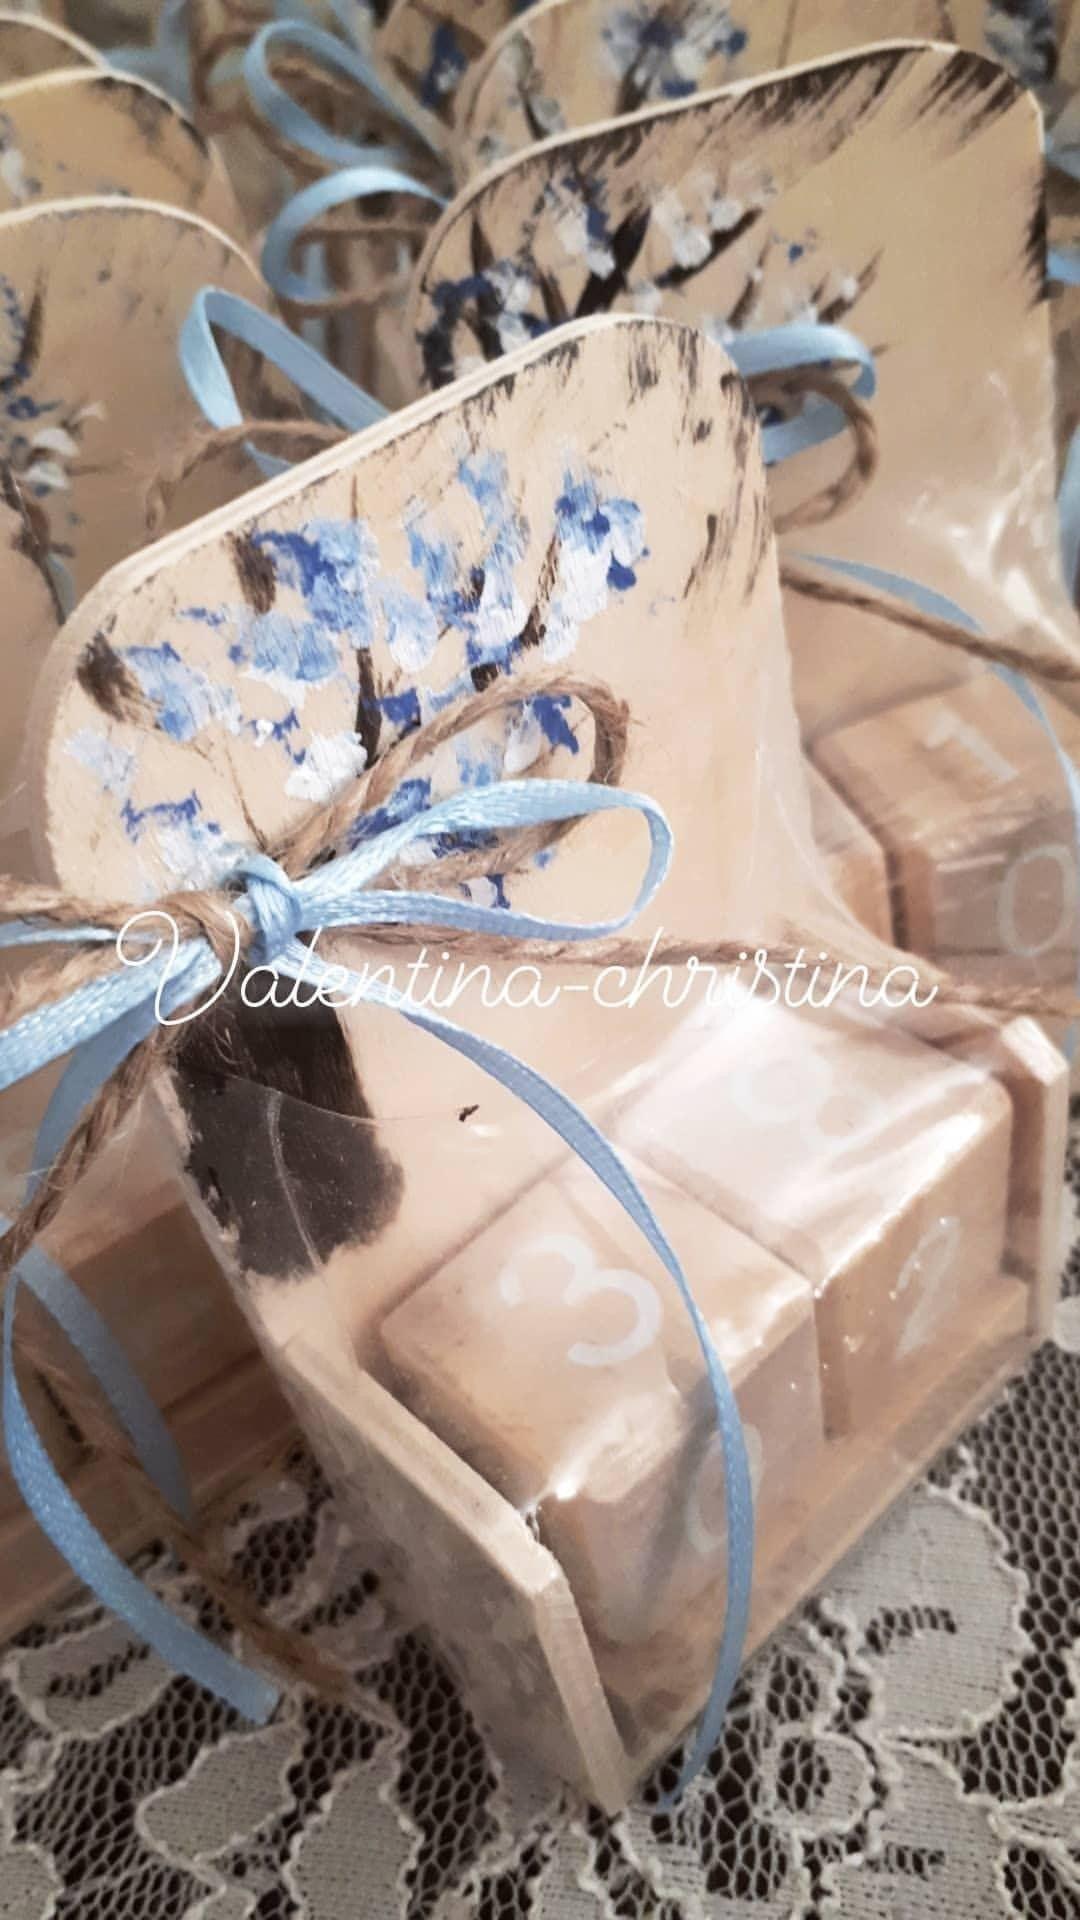 9286da1b81cc Όταν η τέχνη συναντά την δημιουργία μπομπονιέρας!!!!ξύλινο ημερολόγιο με  δέντρο της ζωής by valentina-christina handmade products 2105157506